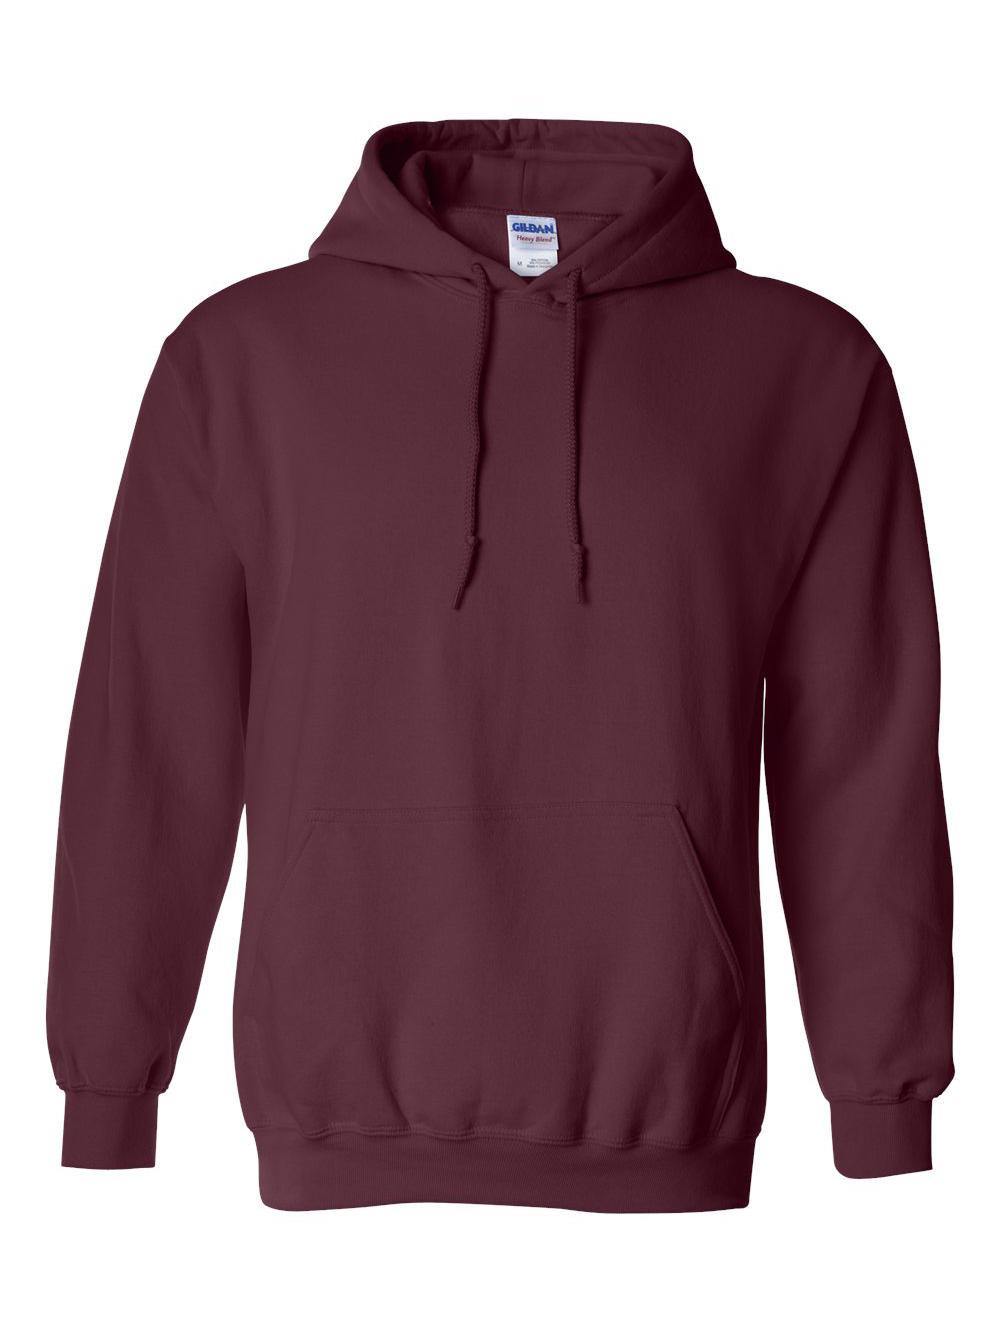 Gildan-Heavy-Blend-Hooded-Sweatshirt-18500 miniatura 78